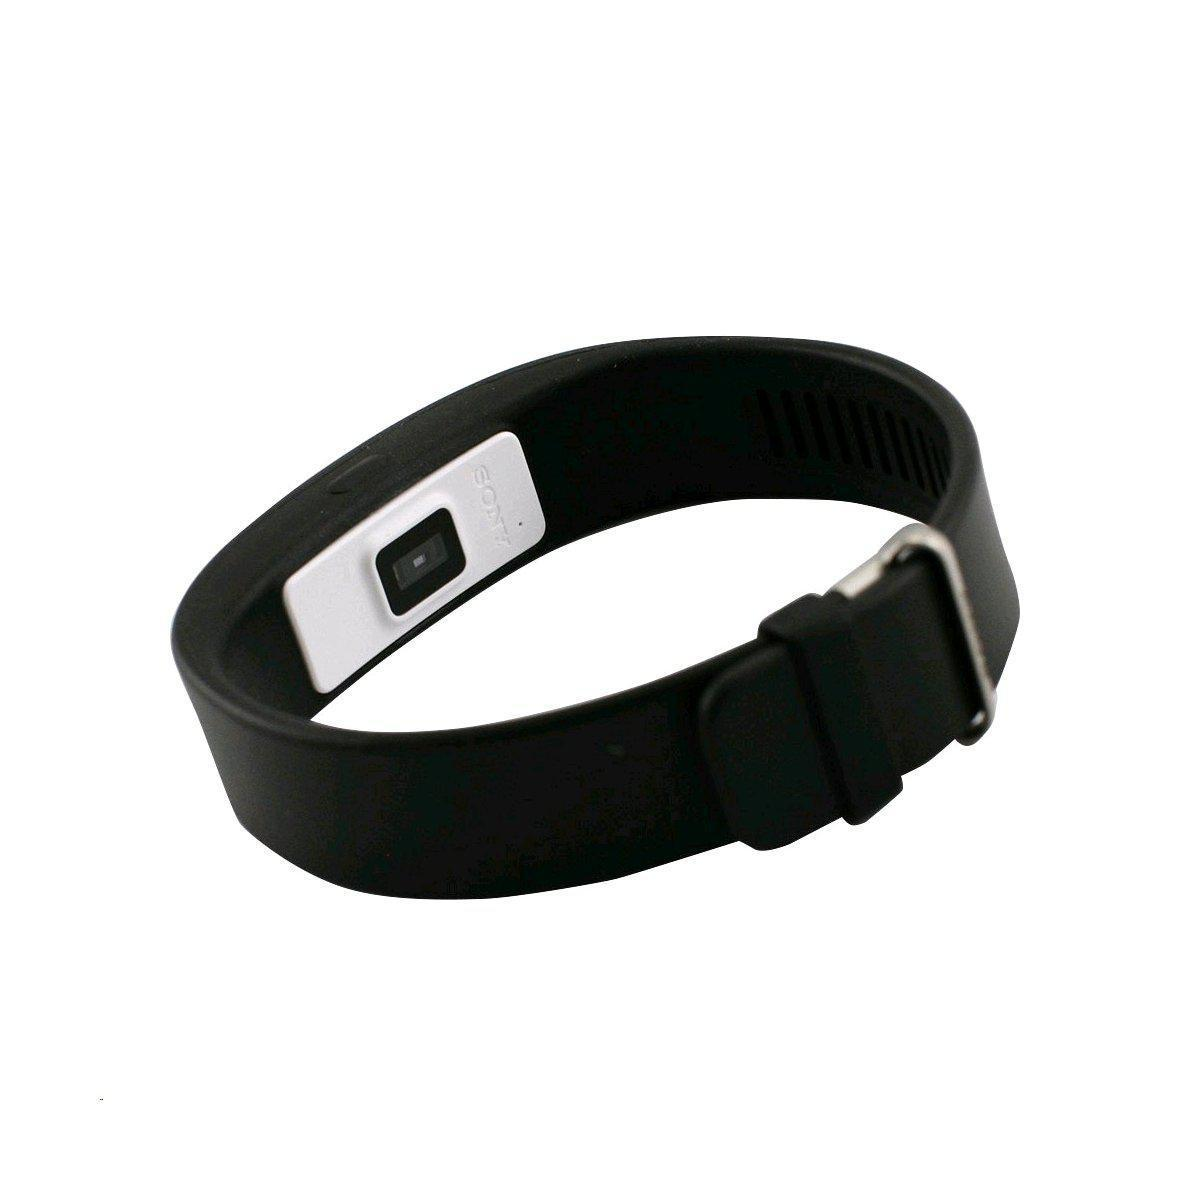 Sony Smartband 2 SWR12 Anslutna enheter